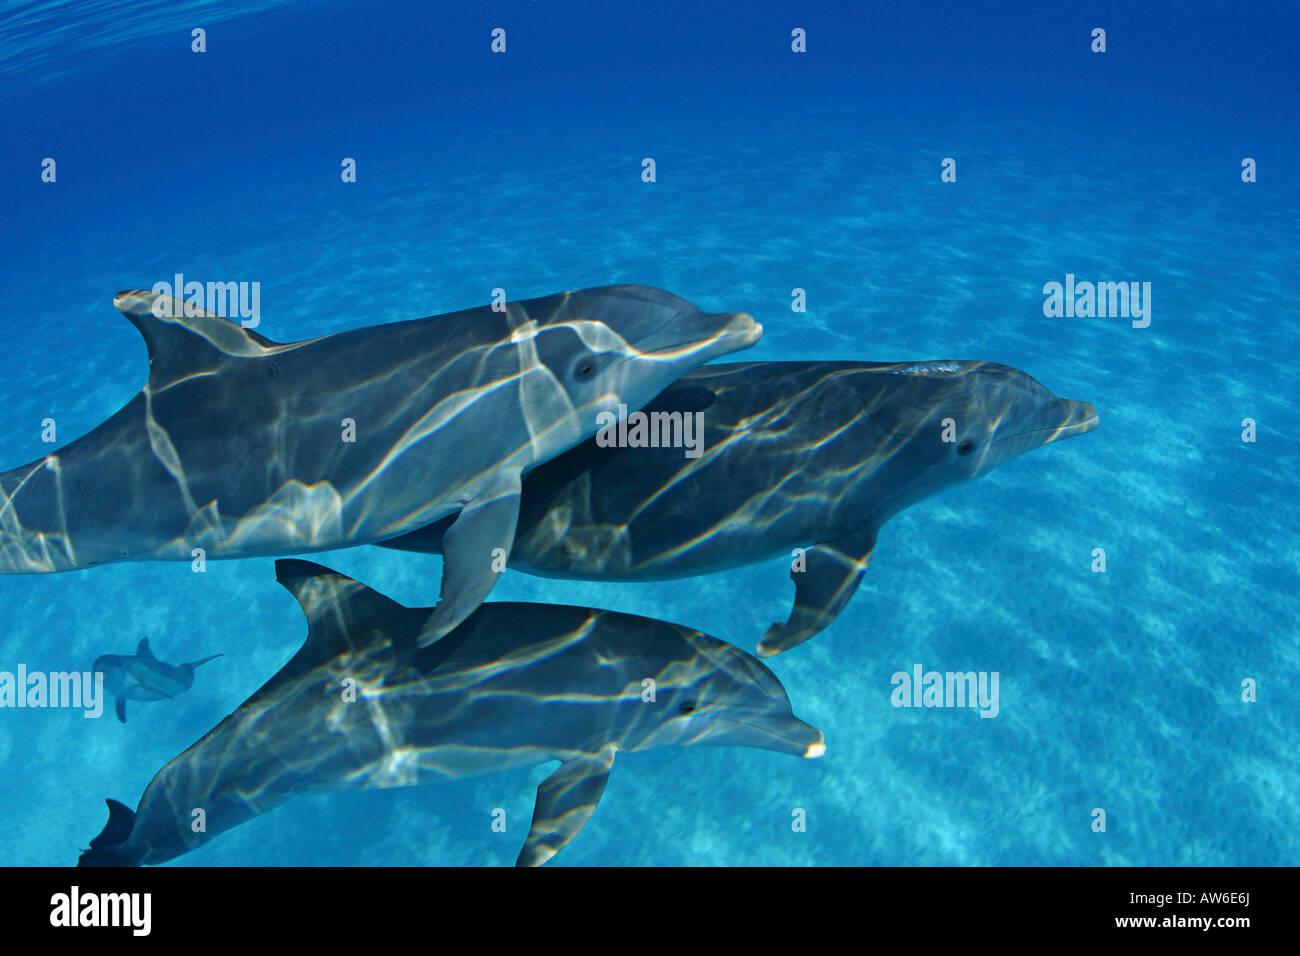 These Atlantic Bottlenose Dolphin, Tursiops truncatus, were photographed on the Bahamas Bank. Stock Photo